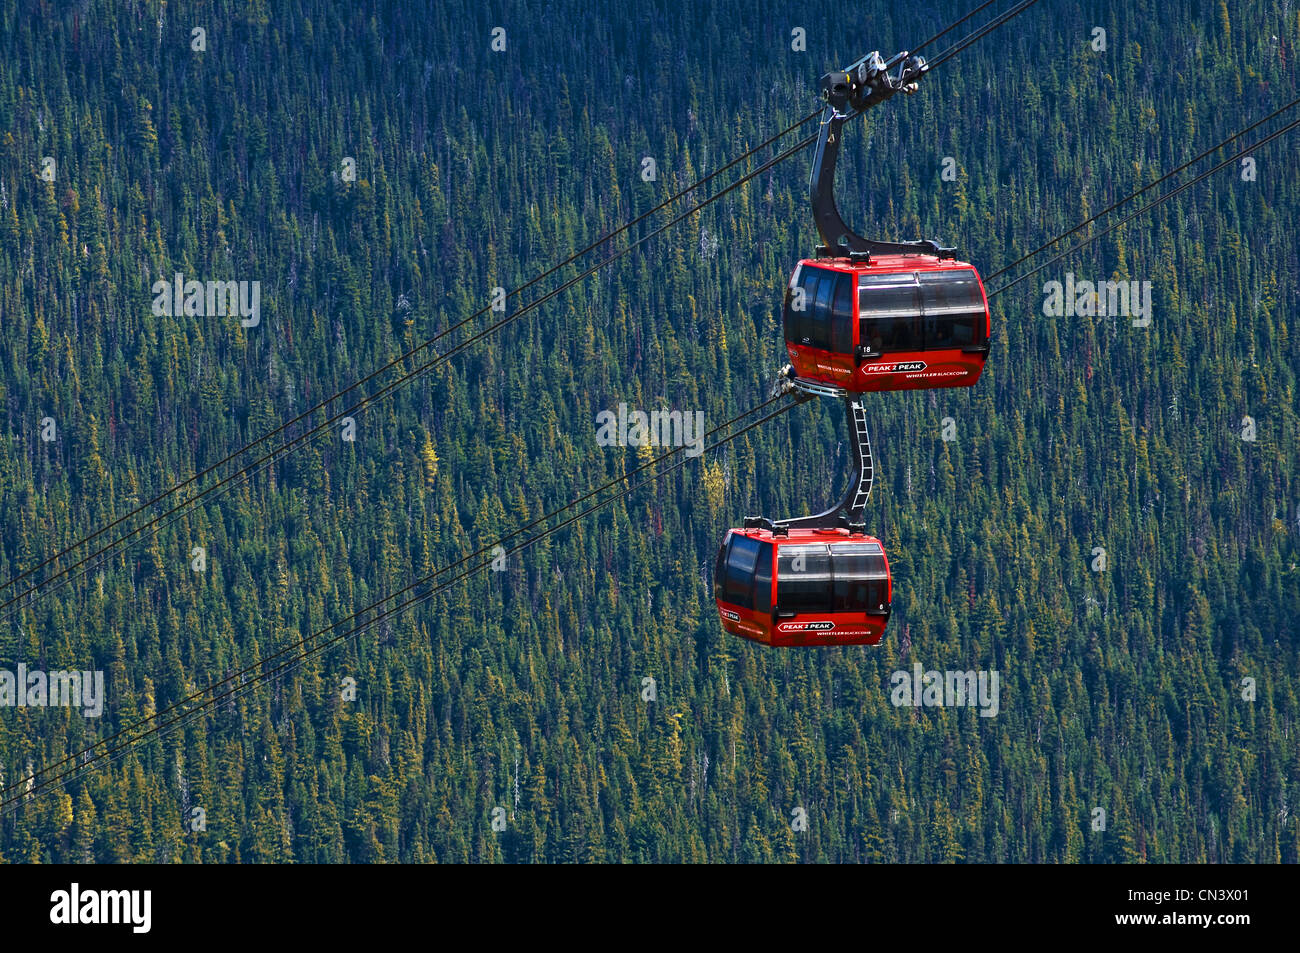 Canada, British Columbia, Whistler, Olympic Games winter 2010, 80 Km north of Vancouver, area of Garibaldi Peak, - Stock Image